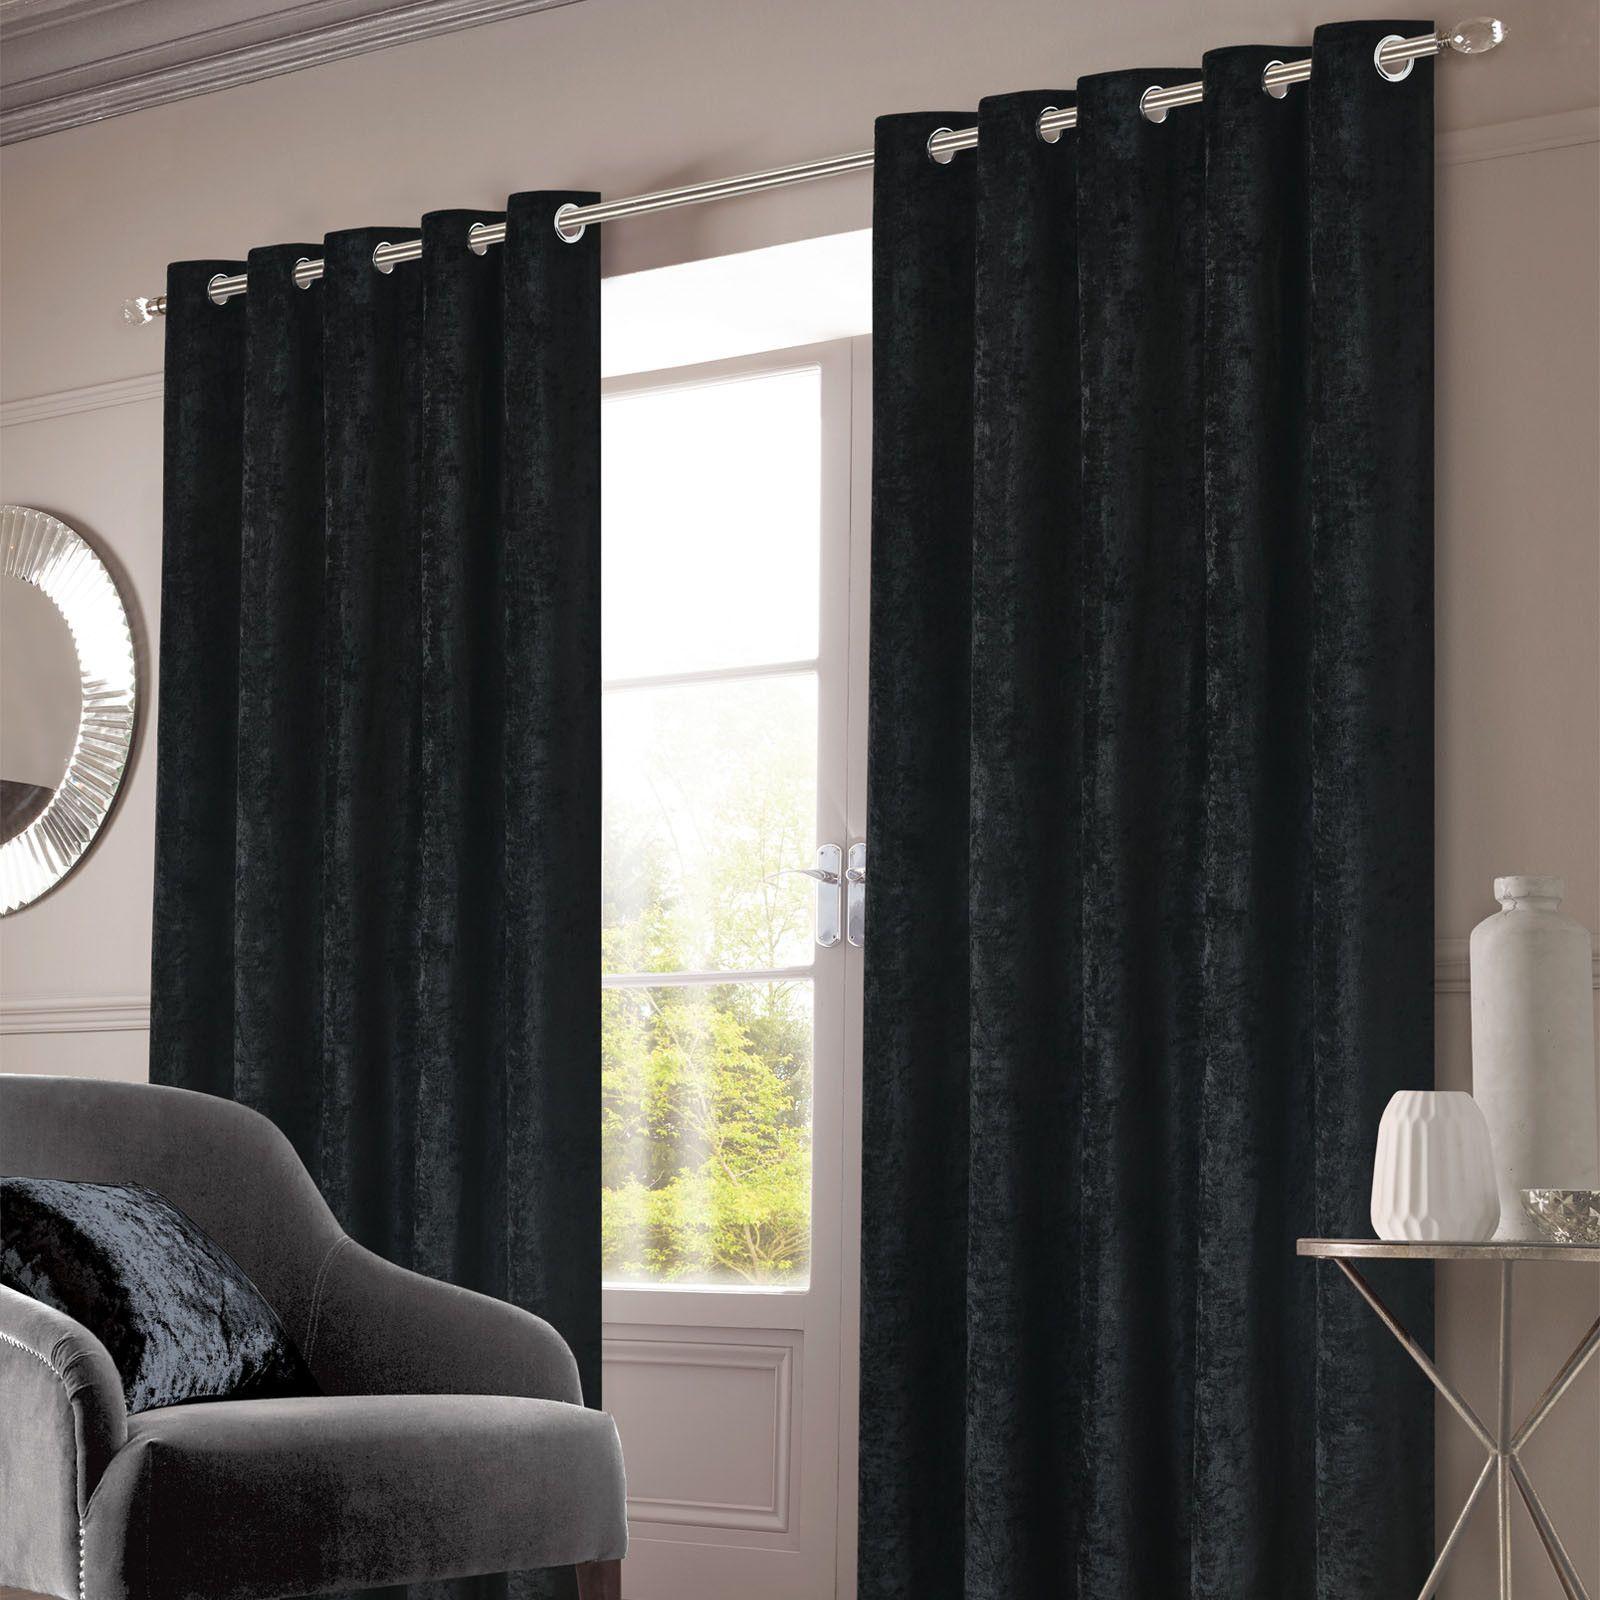 Sienna Home Crushed Velvet Eyelet Curtains Black Black